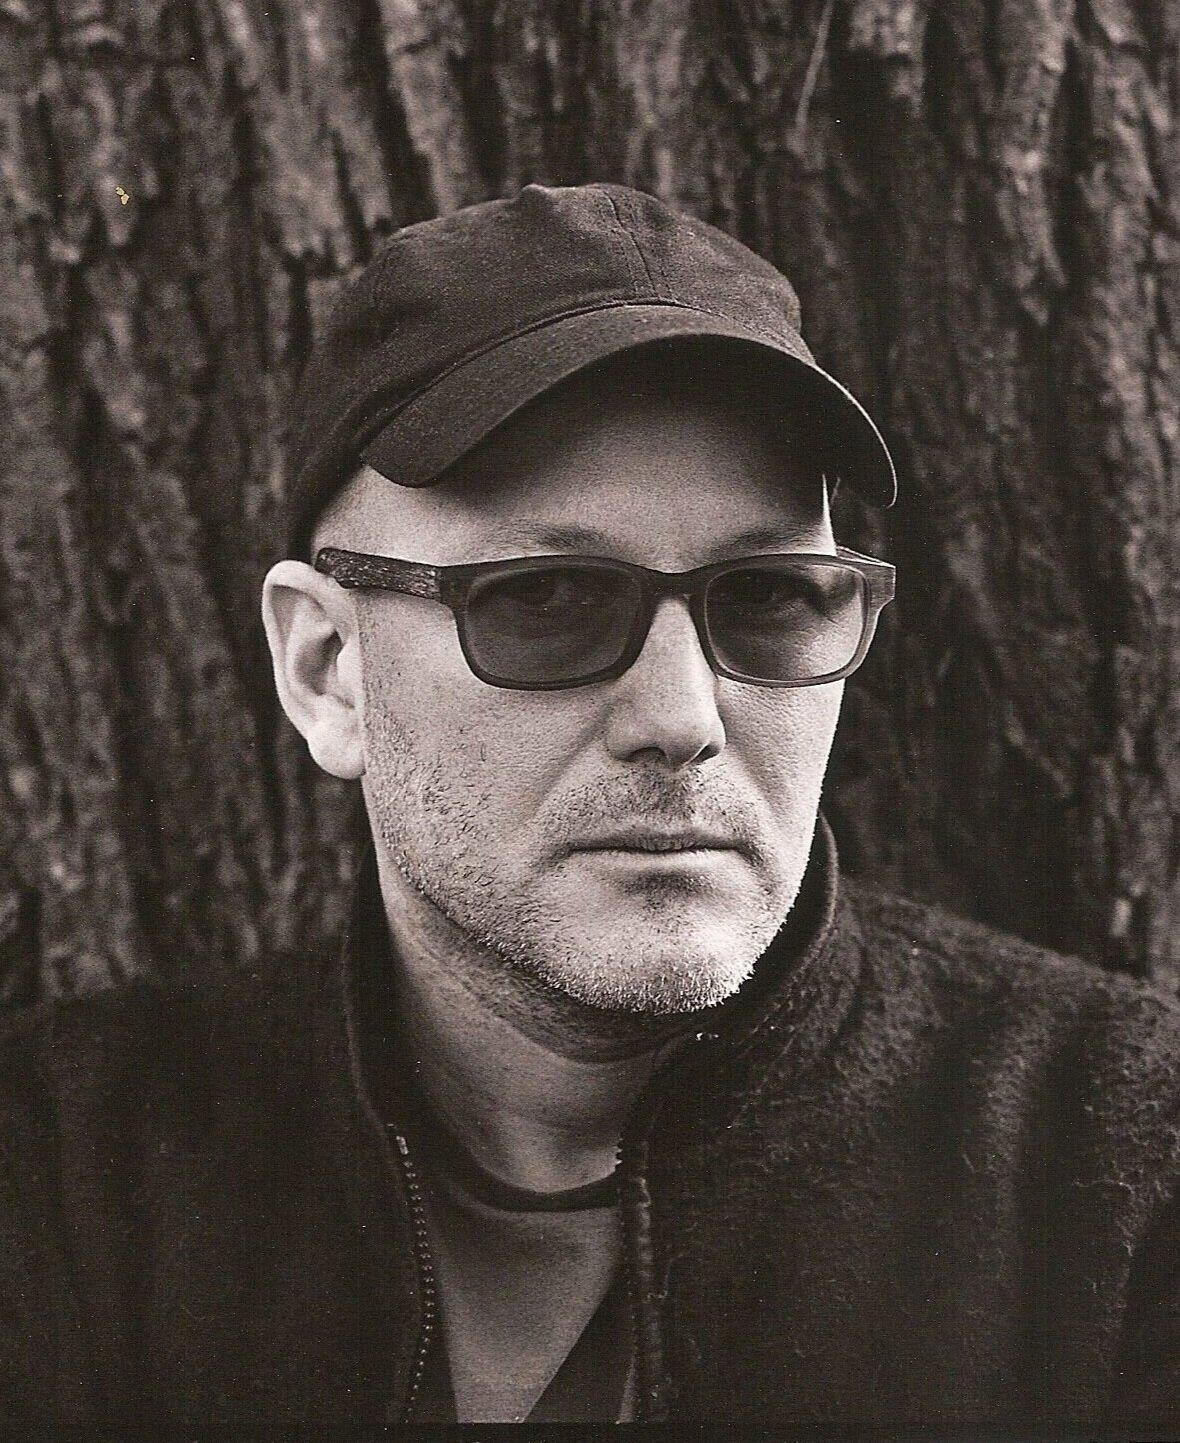 Bill Morrison, photo by Wolfgang Wesener